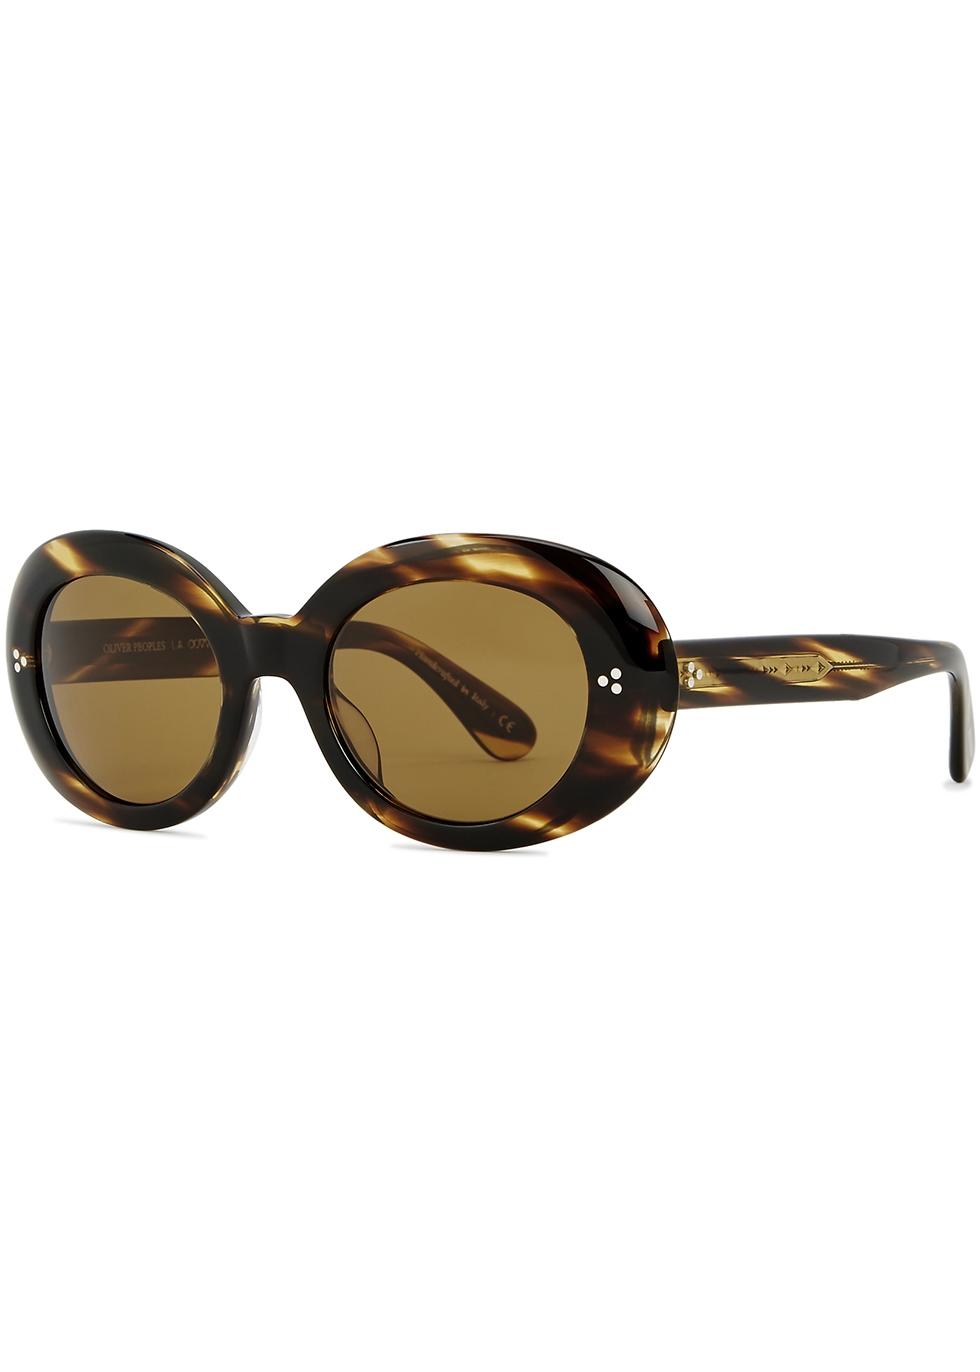 Erissa round-frame sunglasses - Oliver Peoples